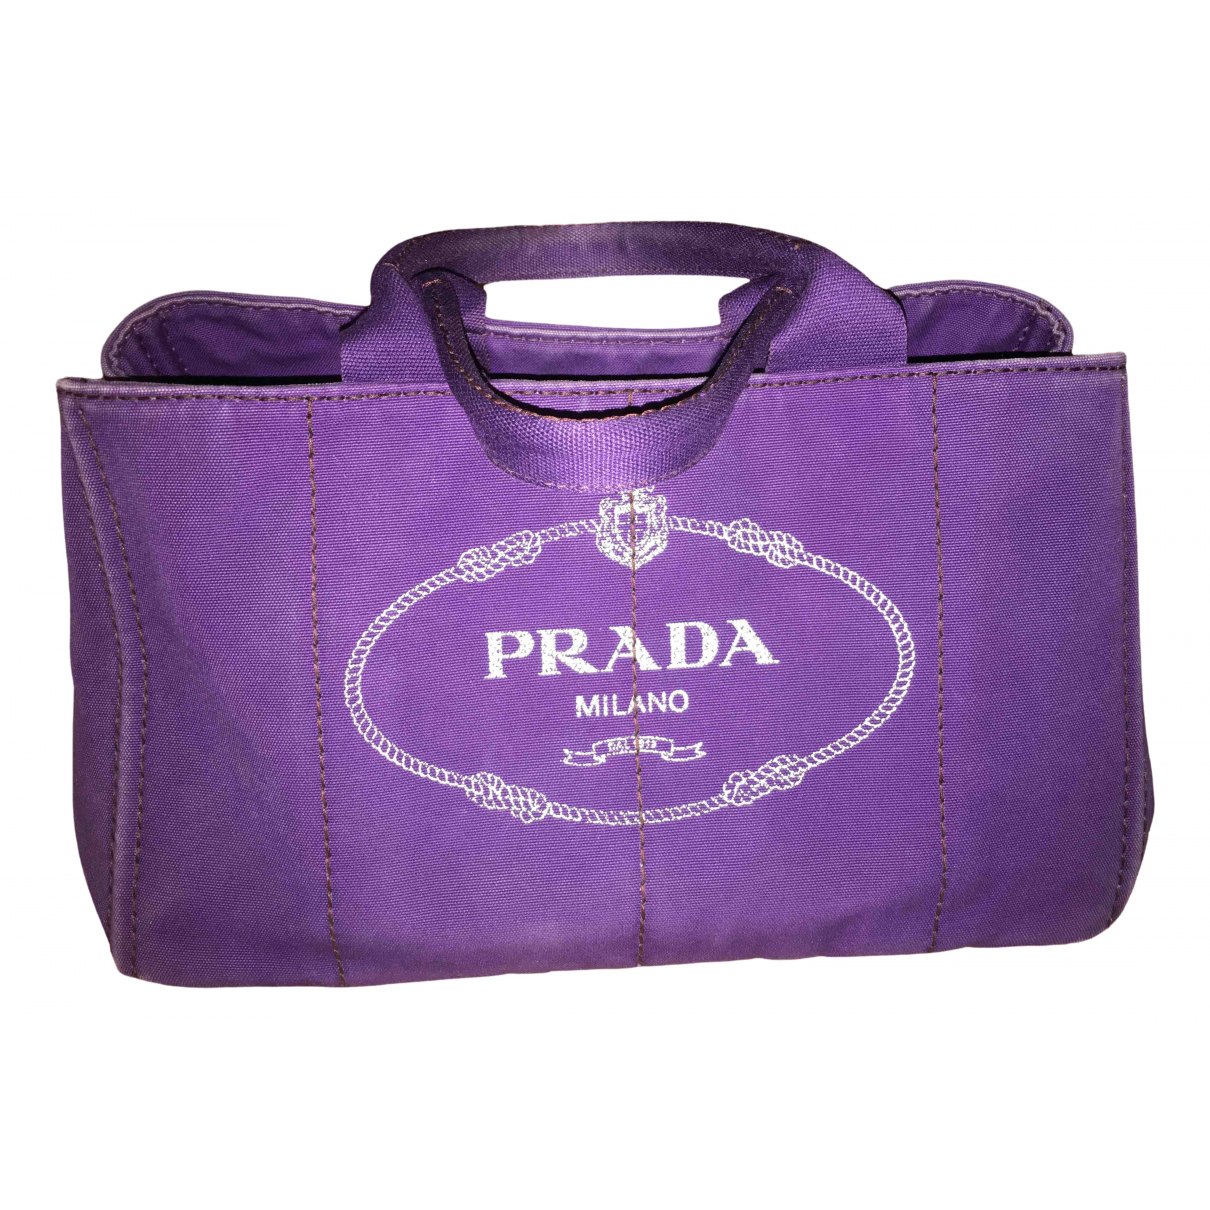 Prada \N Handtasche in  Lila Leinen